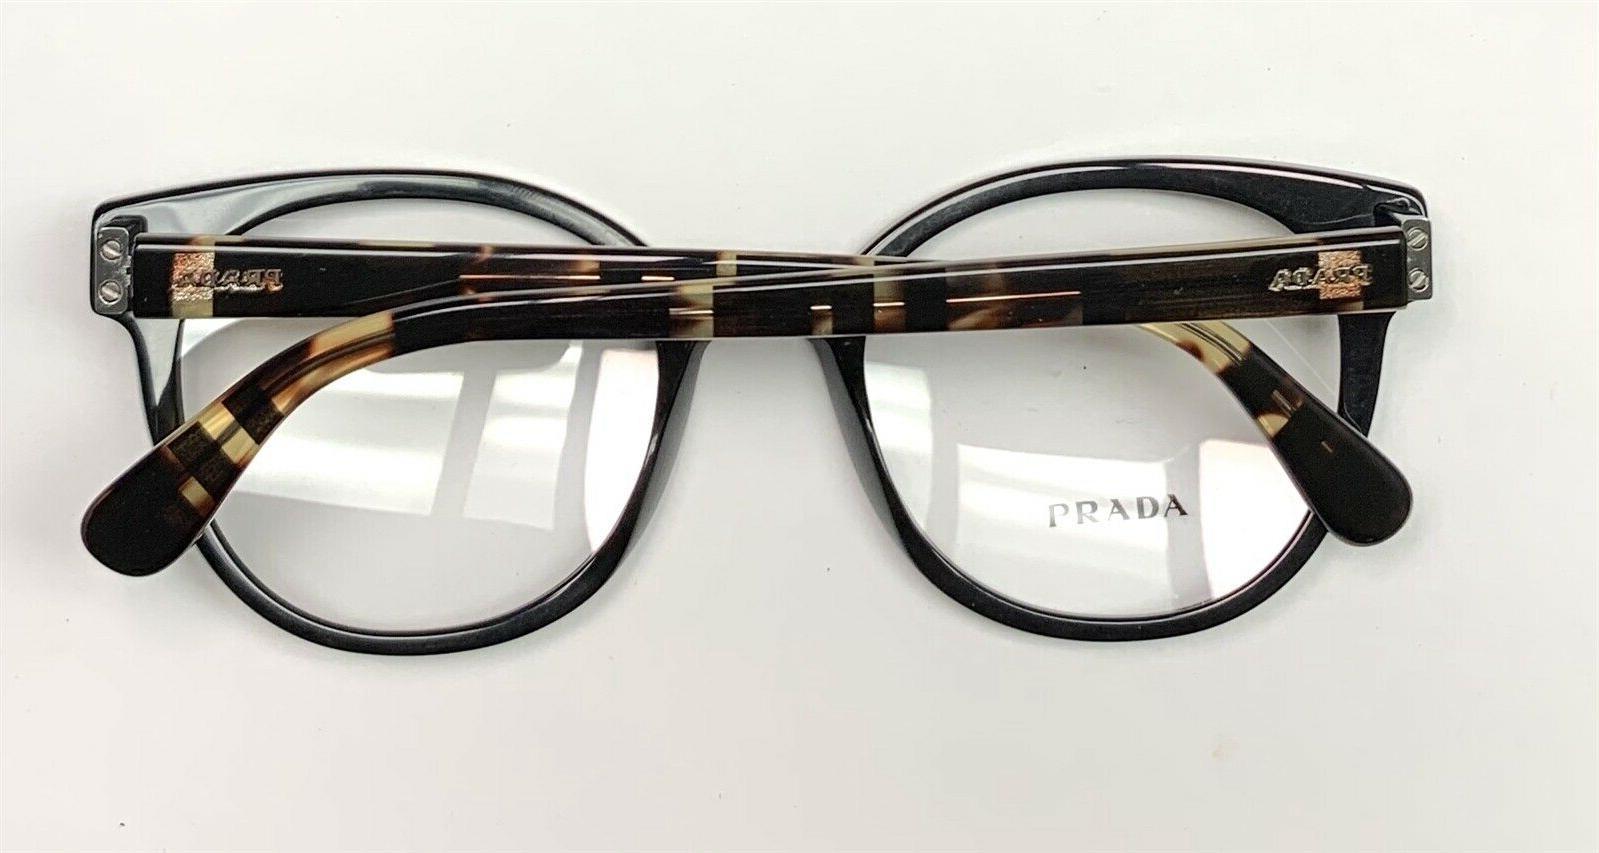 Prada 06T Eyeglasses on Havana Size 50-20-135